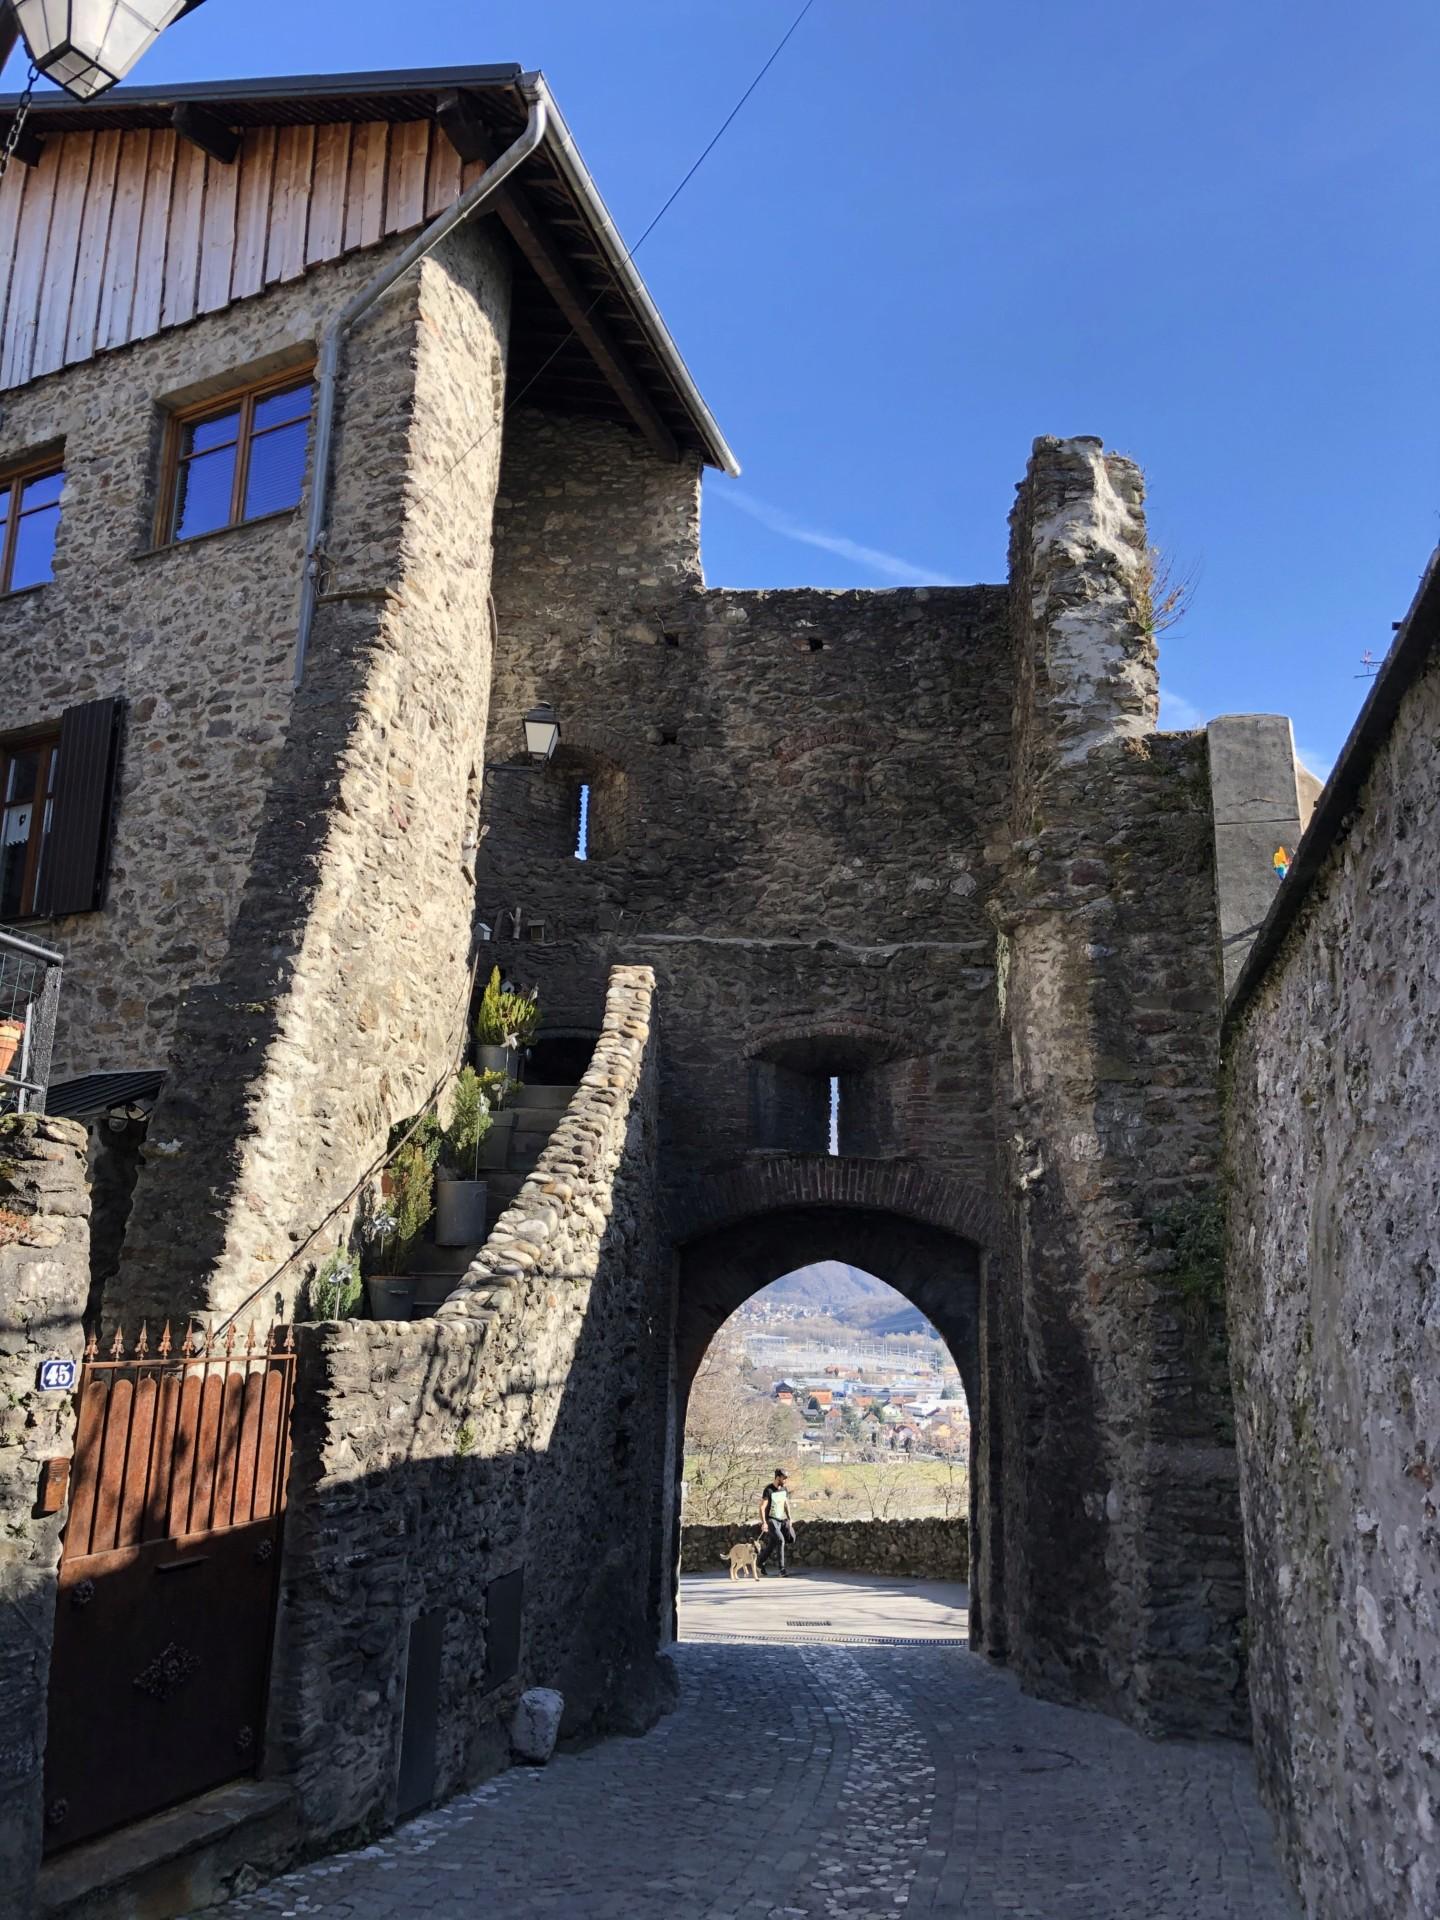 Petites balades en Rhône-Alpes - Page 2 Confla12